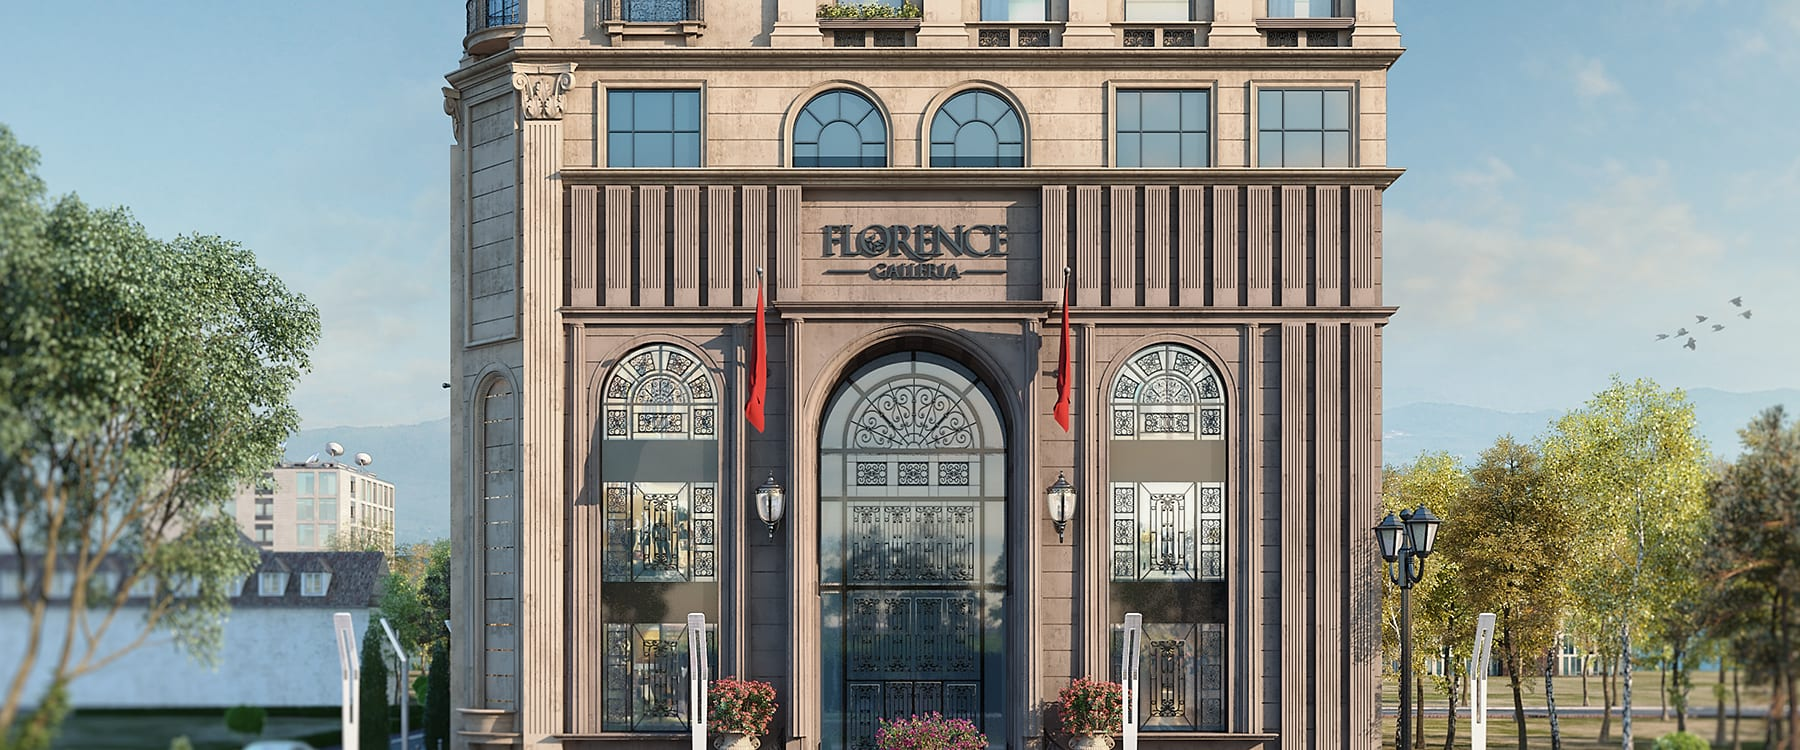 Florence Galleria, Islamabad | Graana.com